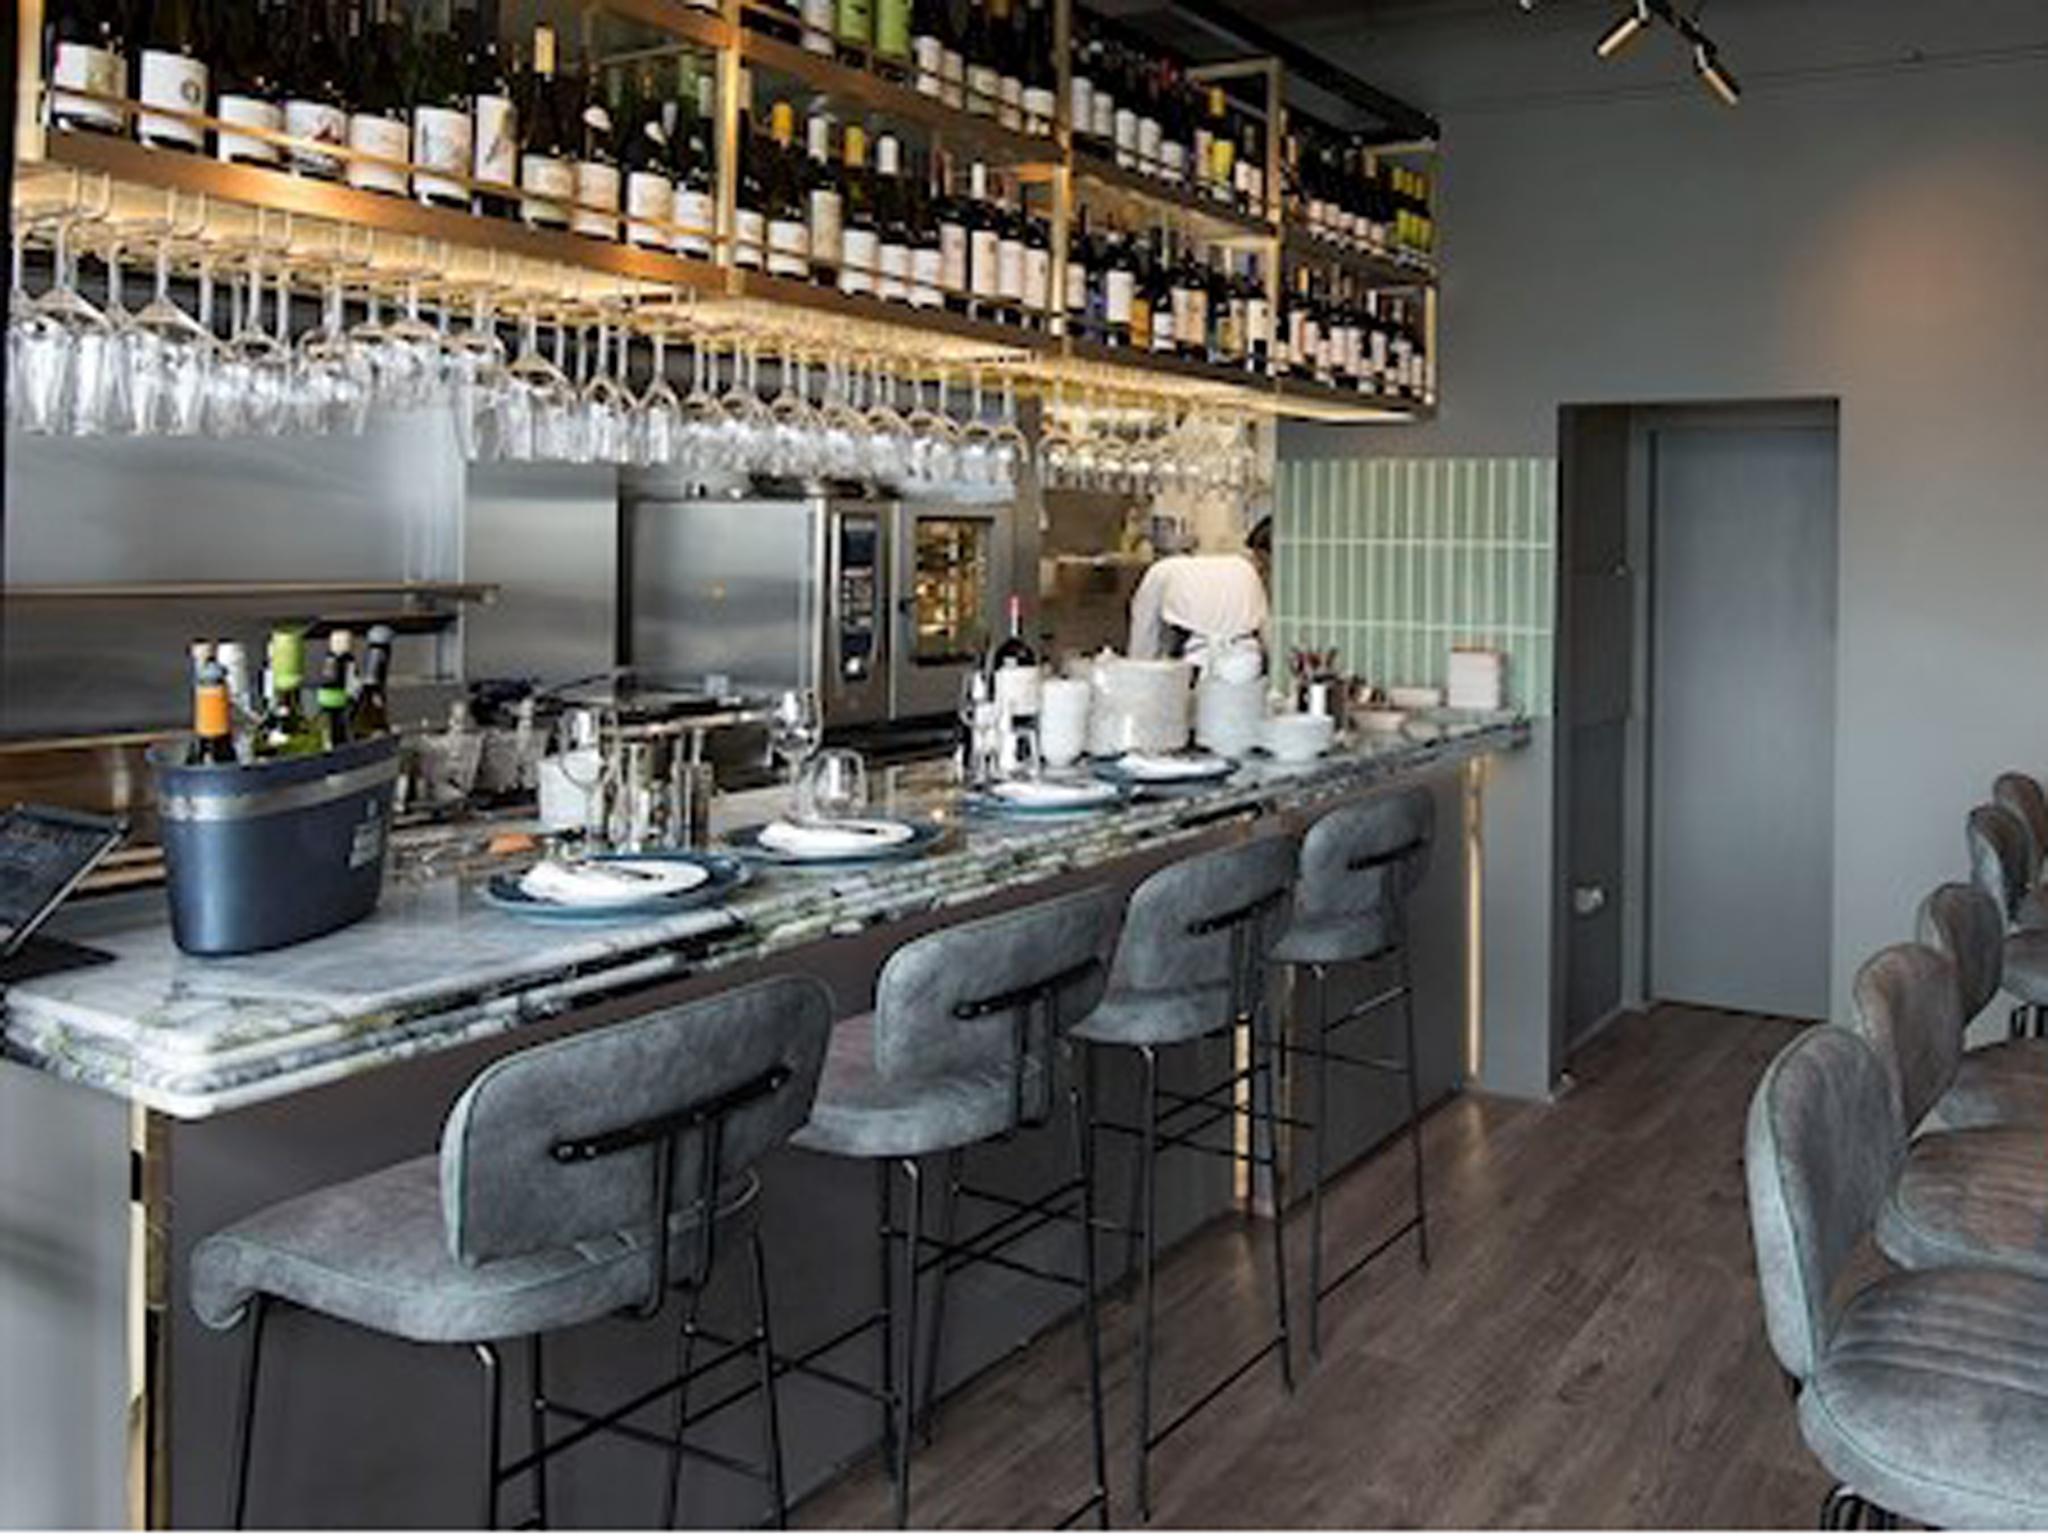 The interior of Michael's restaurant in Dublin